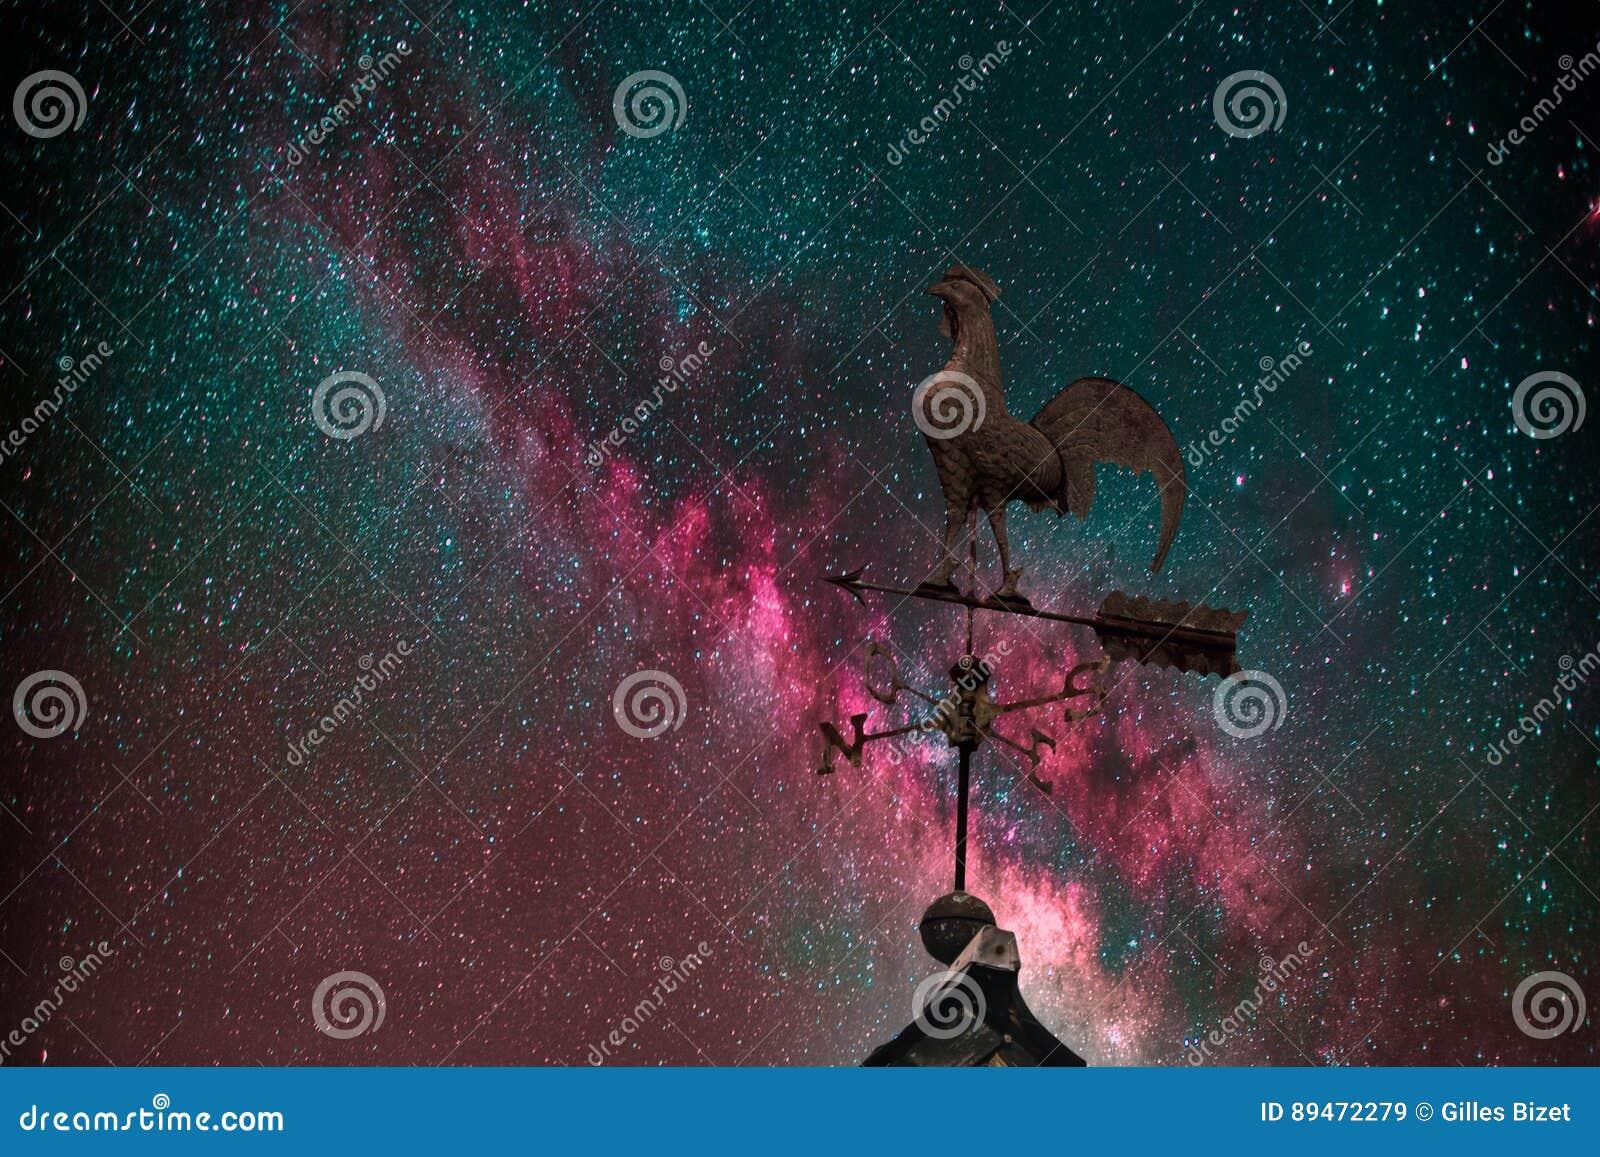 Milky Way, weather vane and stars